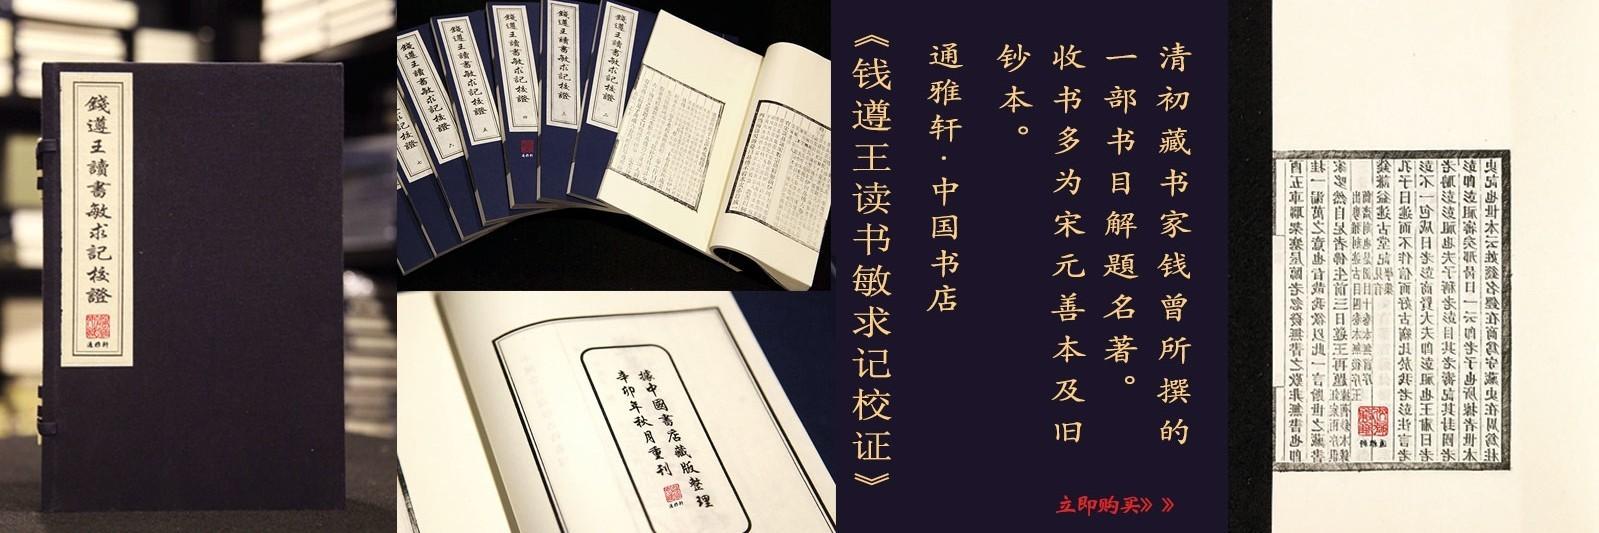 http://book.kongfz.com/3669/1847313160/